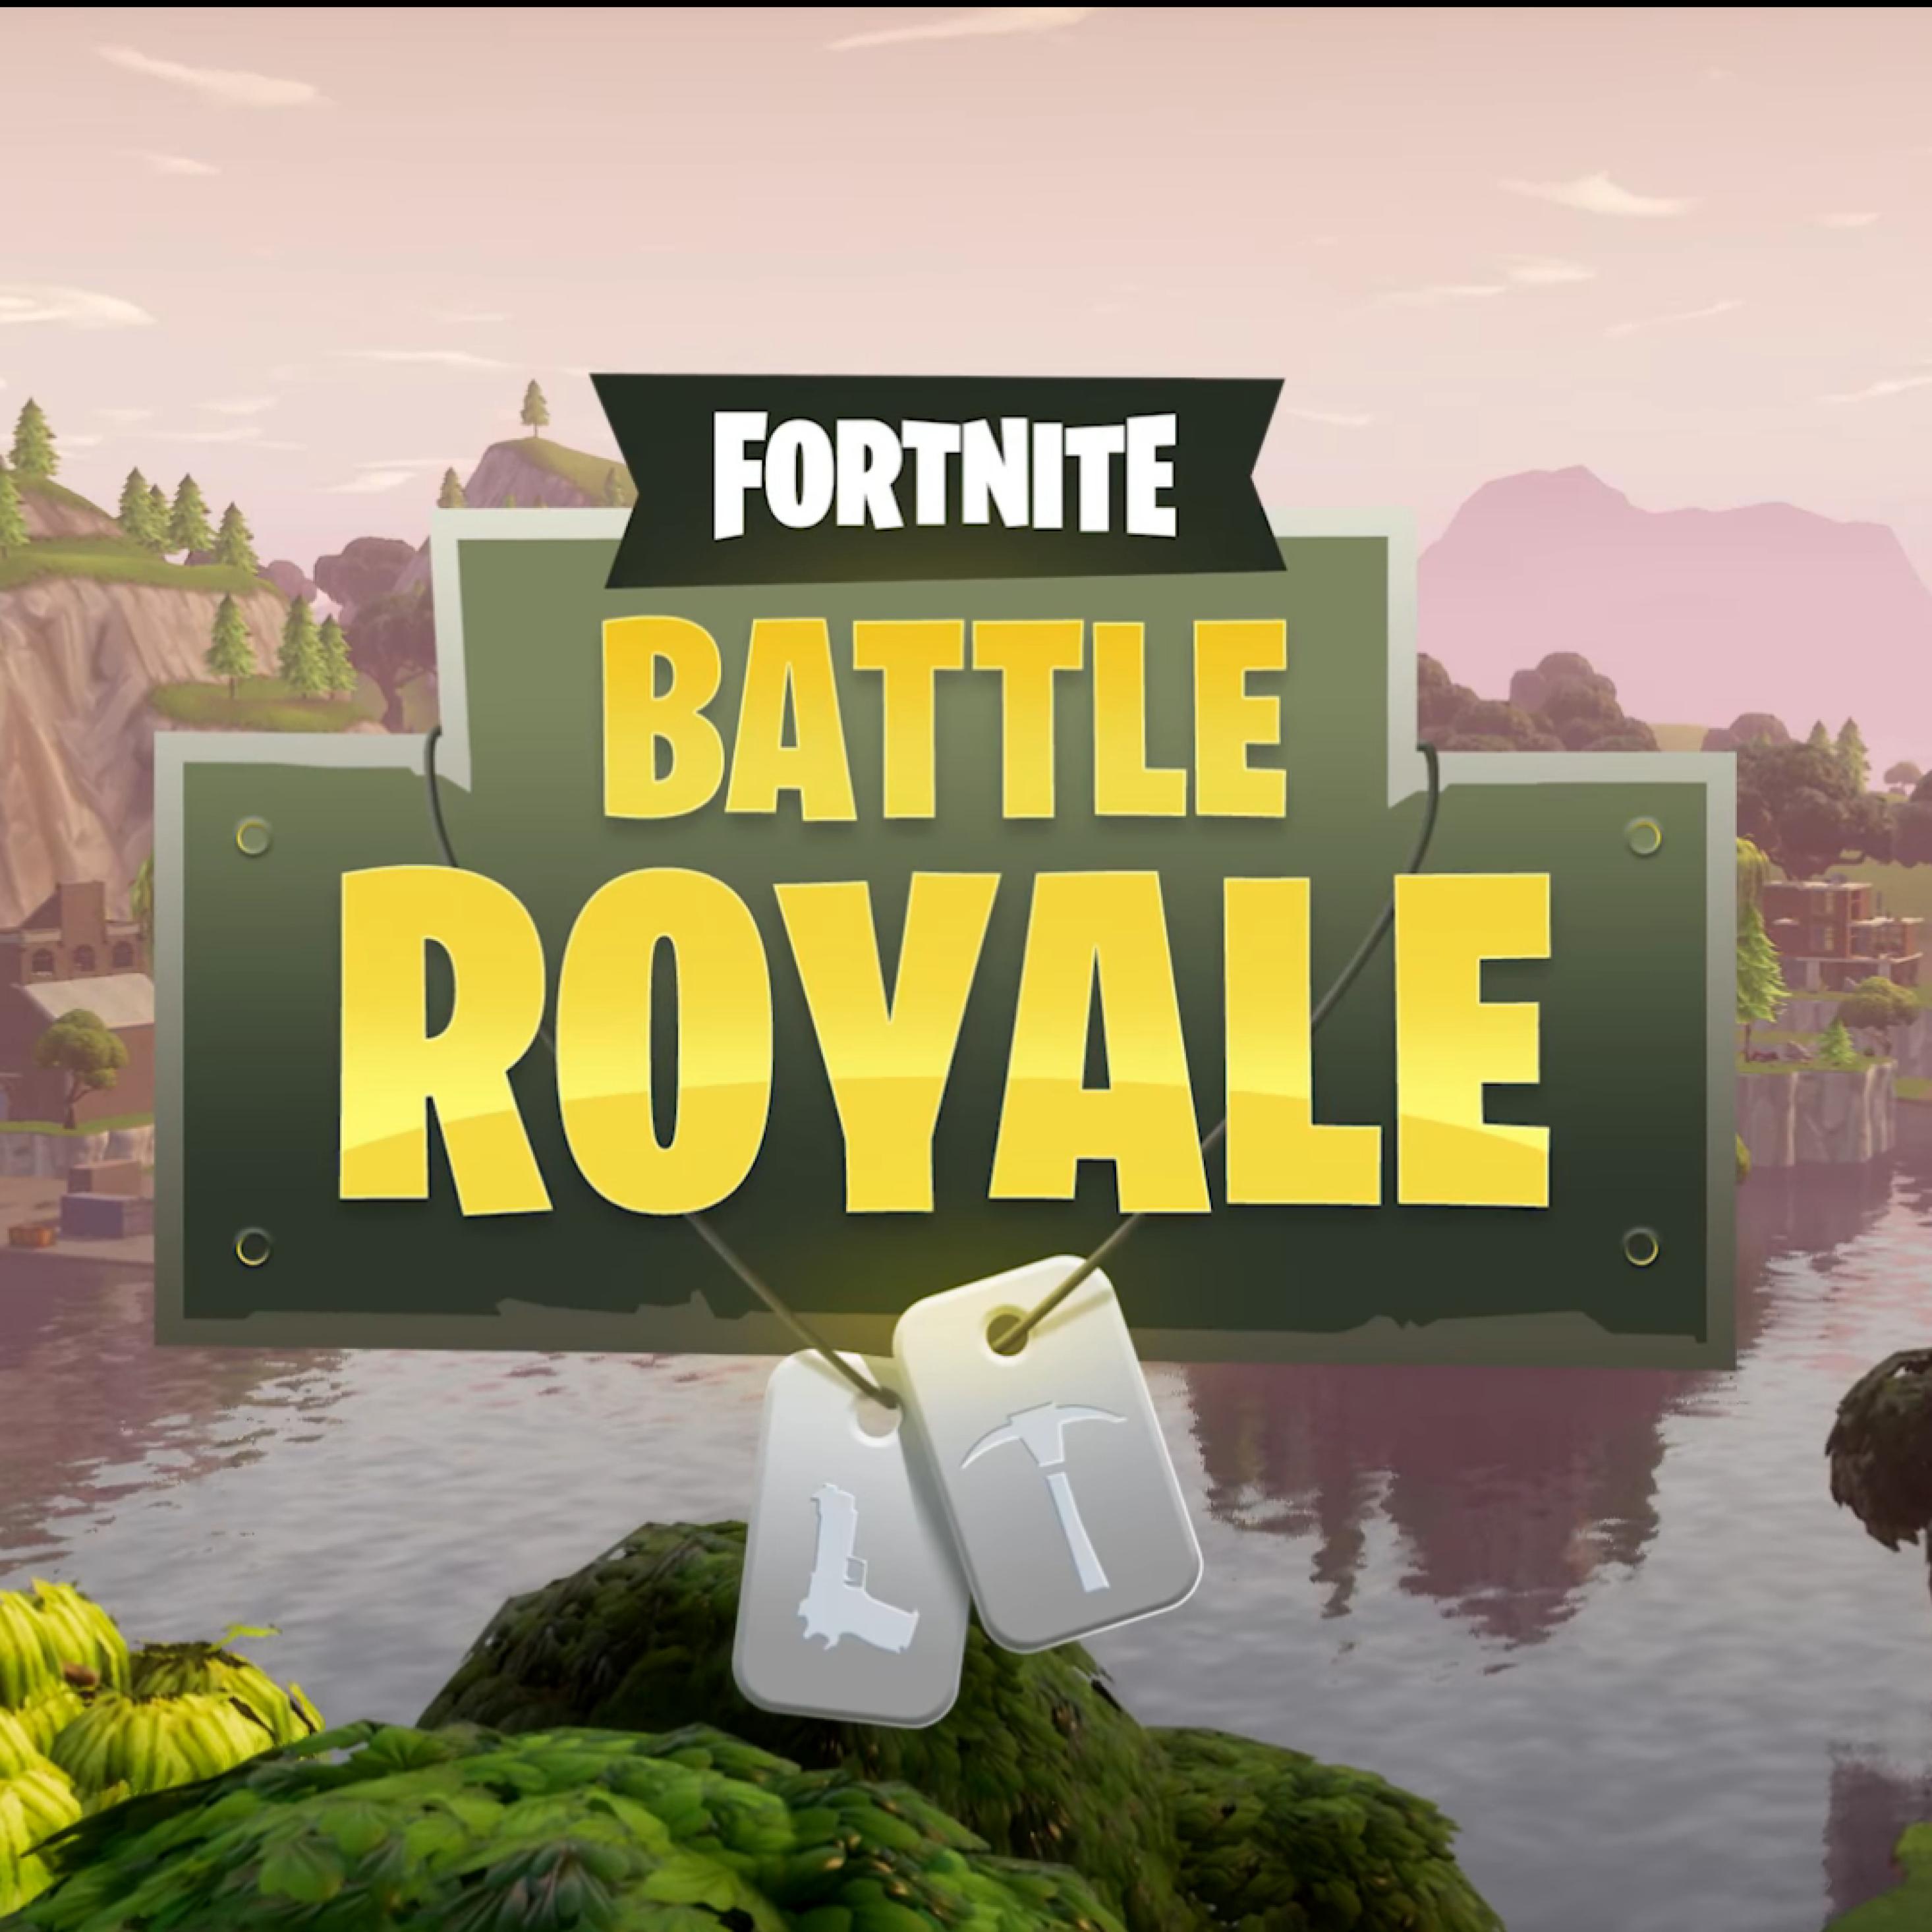 download fortnite battle royale game poster 2560x1600